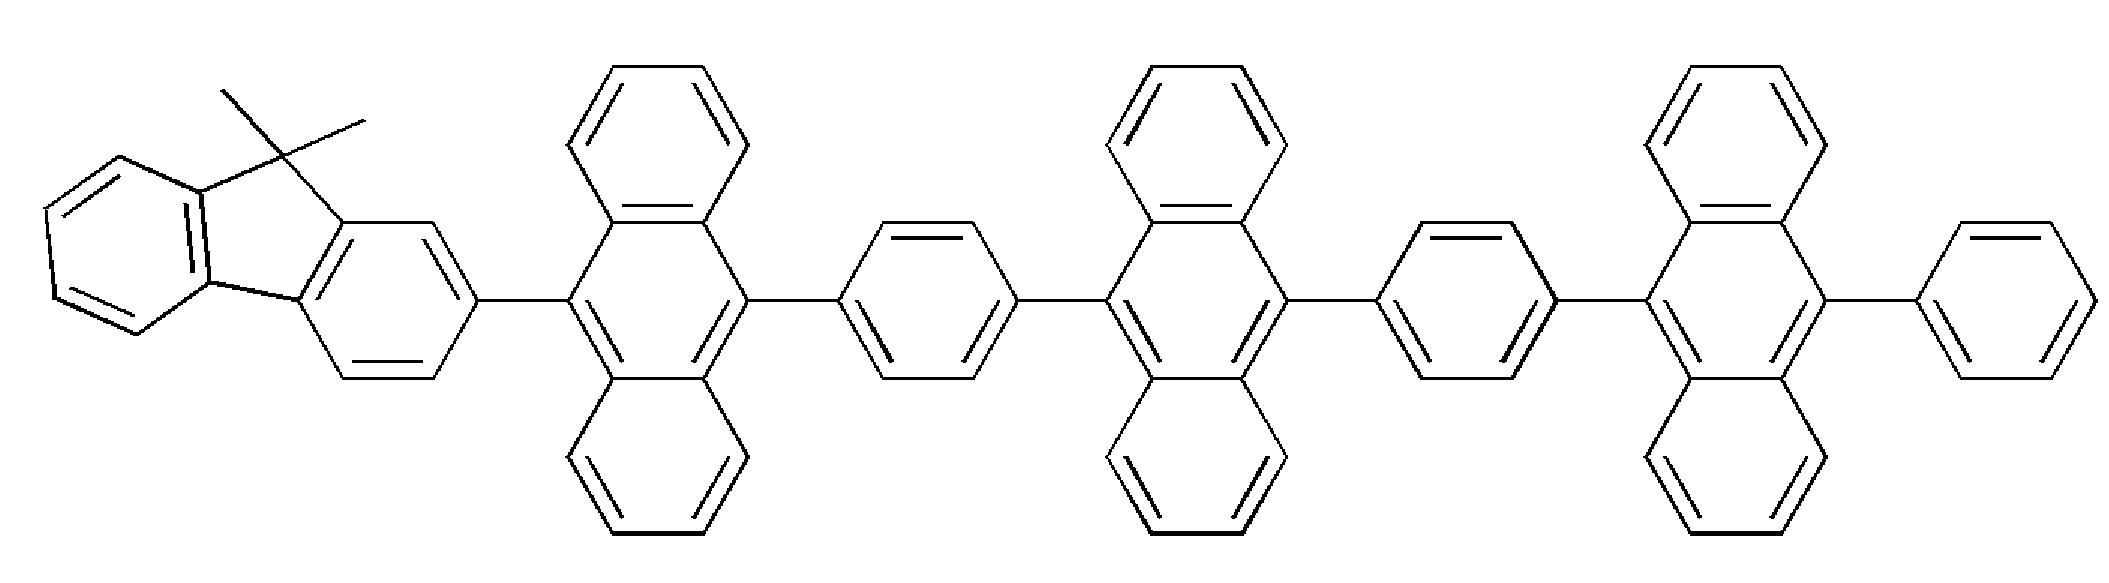 Figure 112007083008831-pat00581